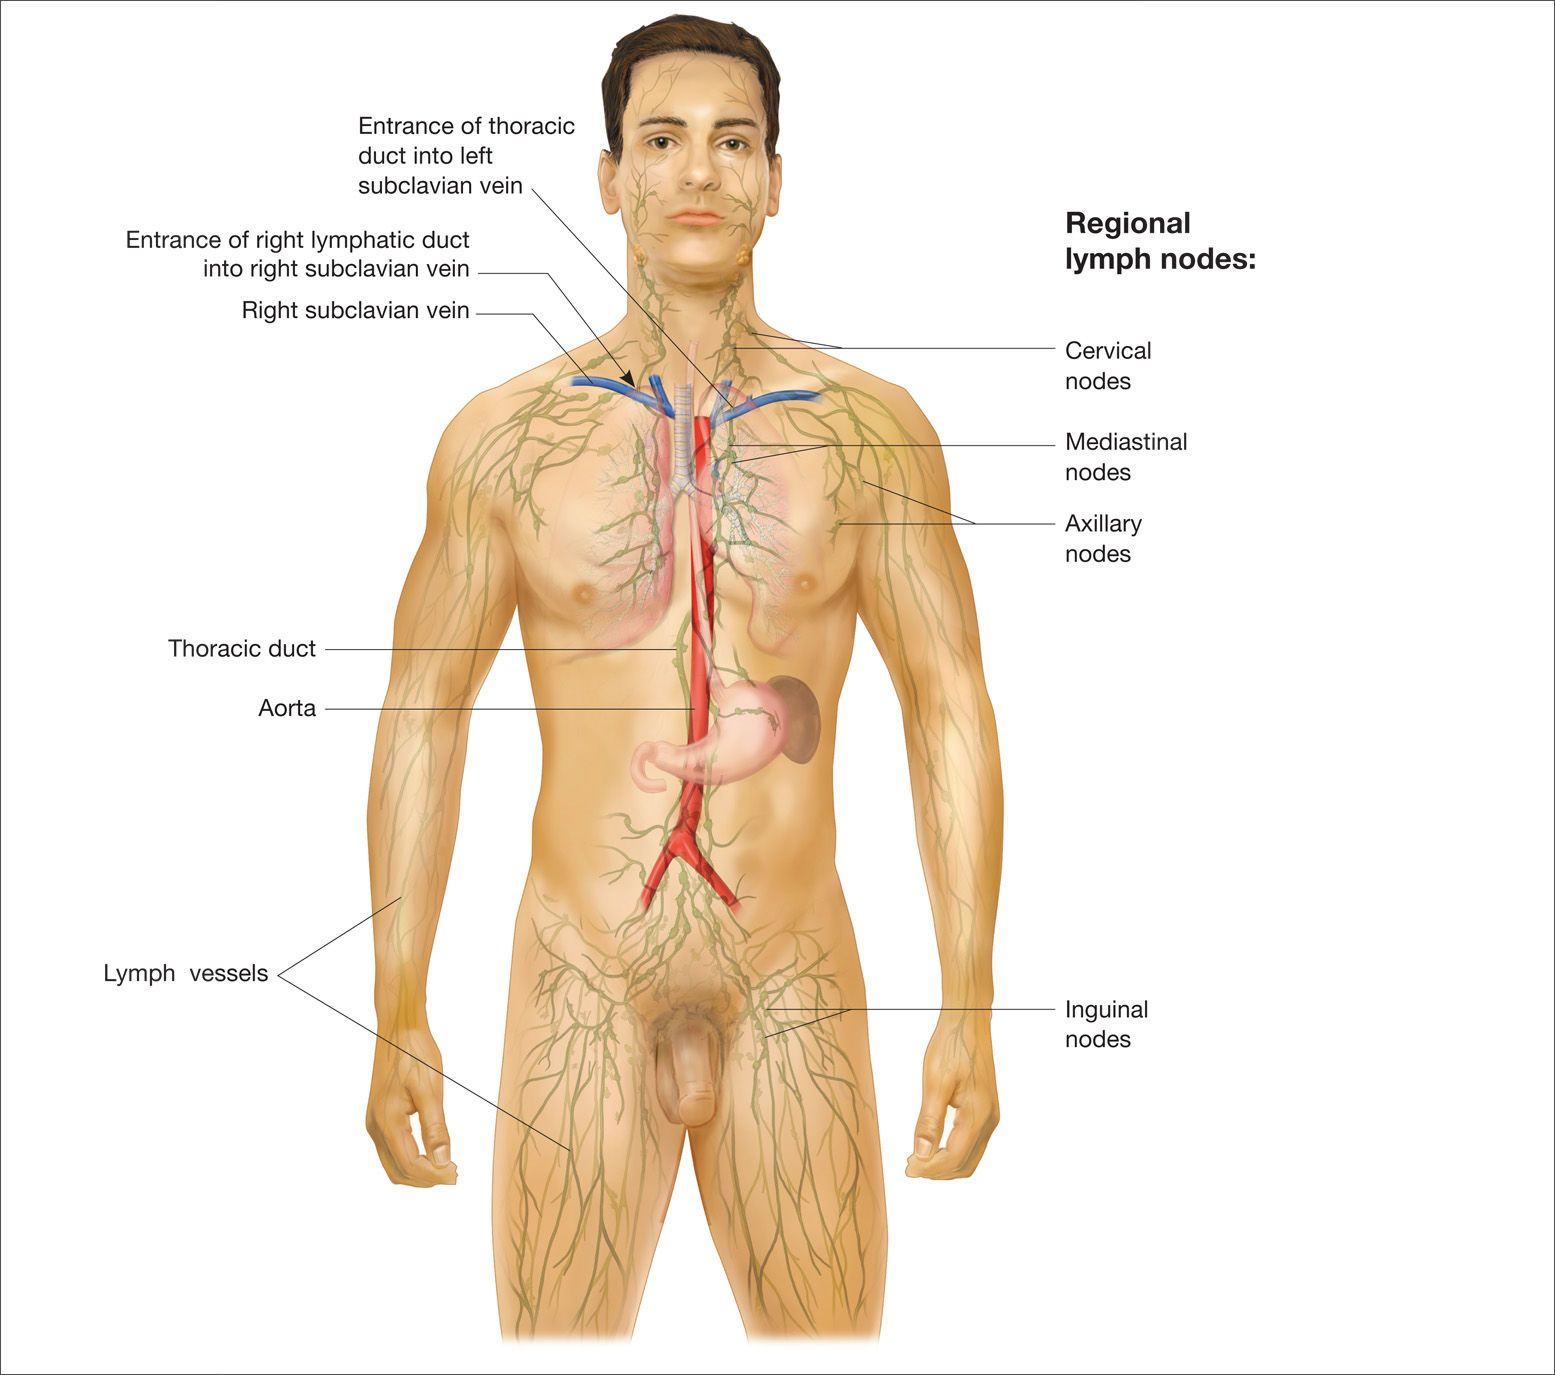 Male Human Anatomy Diagram Human Anatomy Organs Anatomy Organs